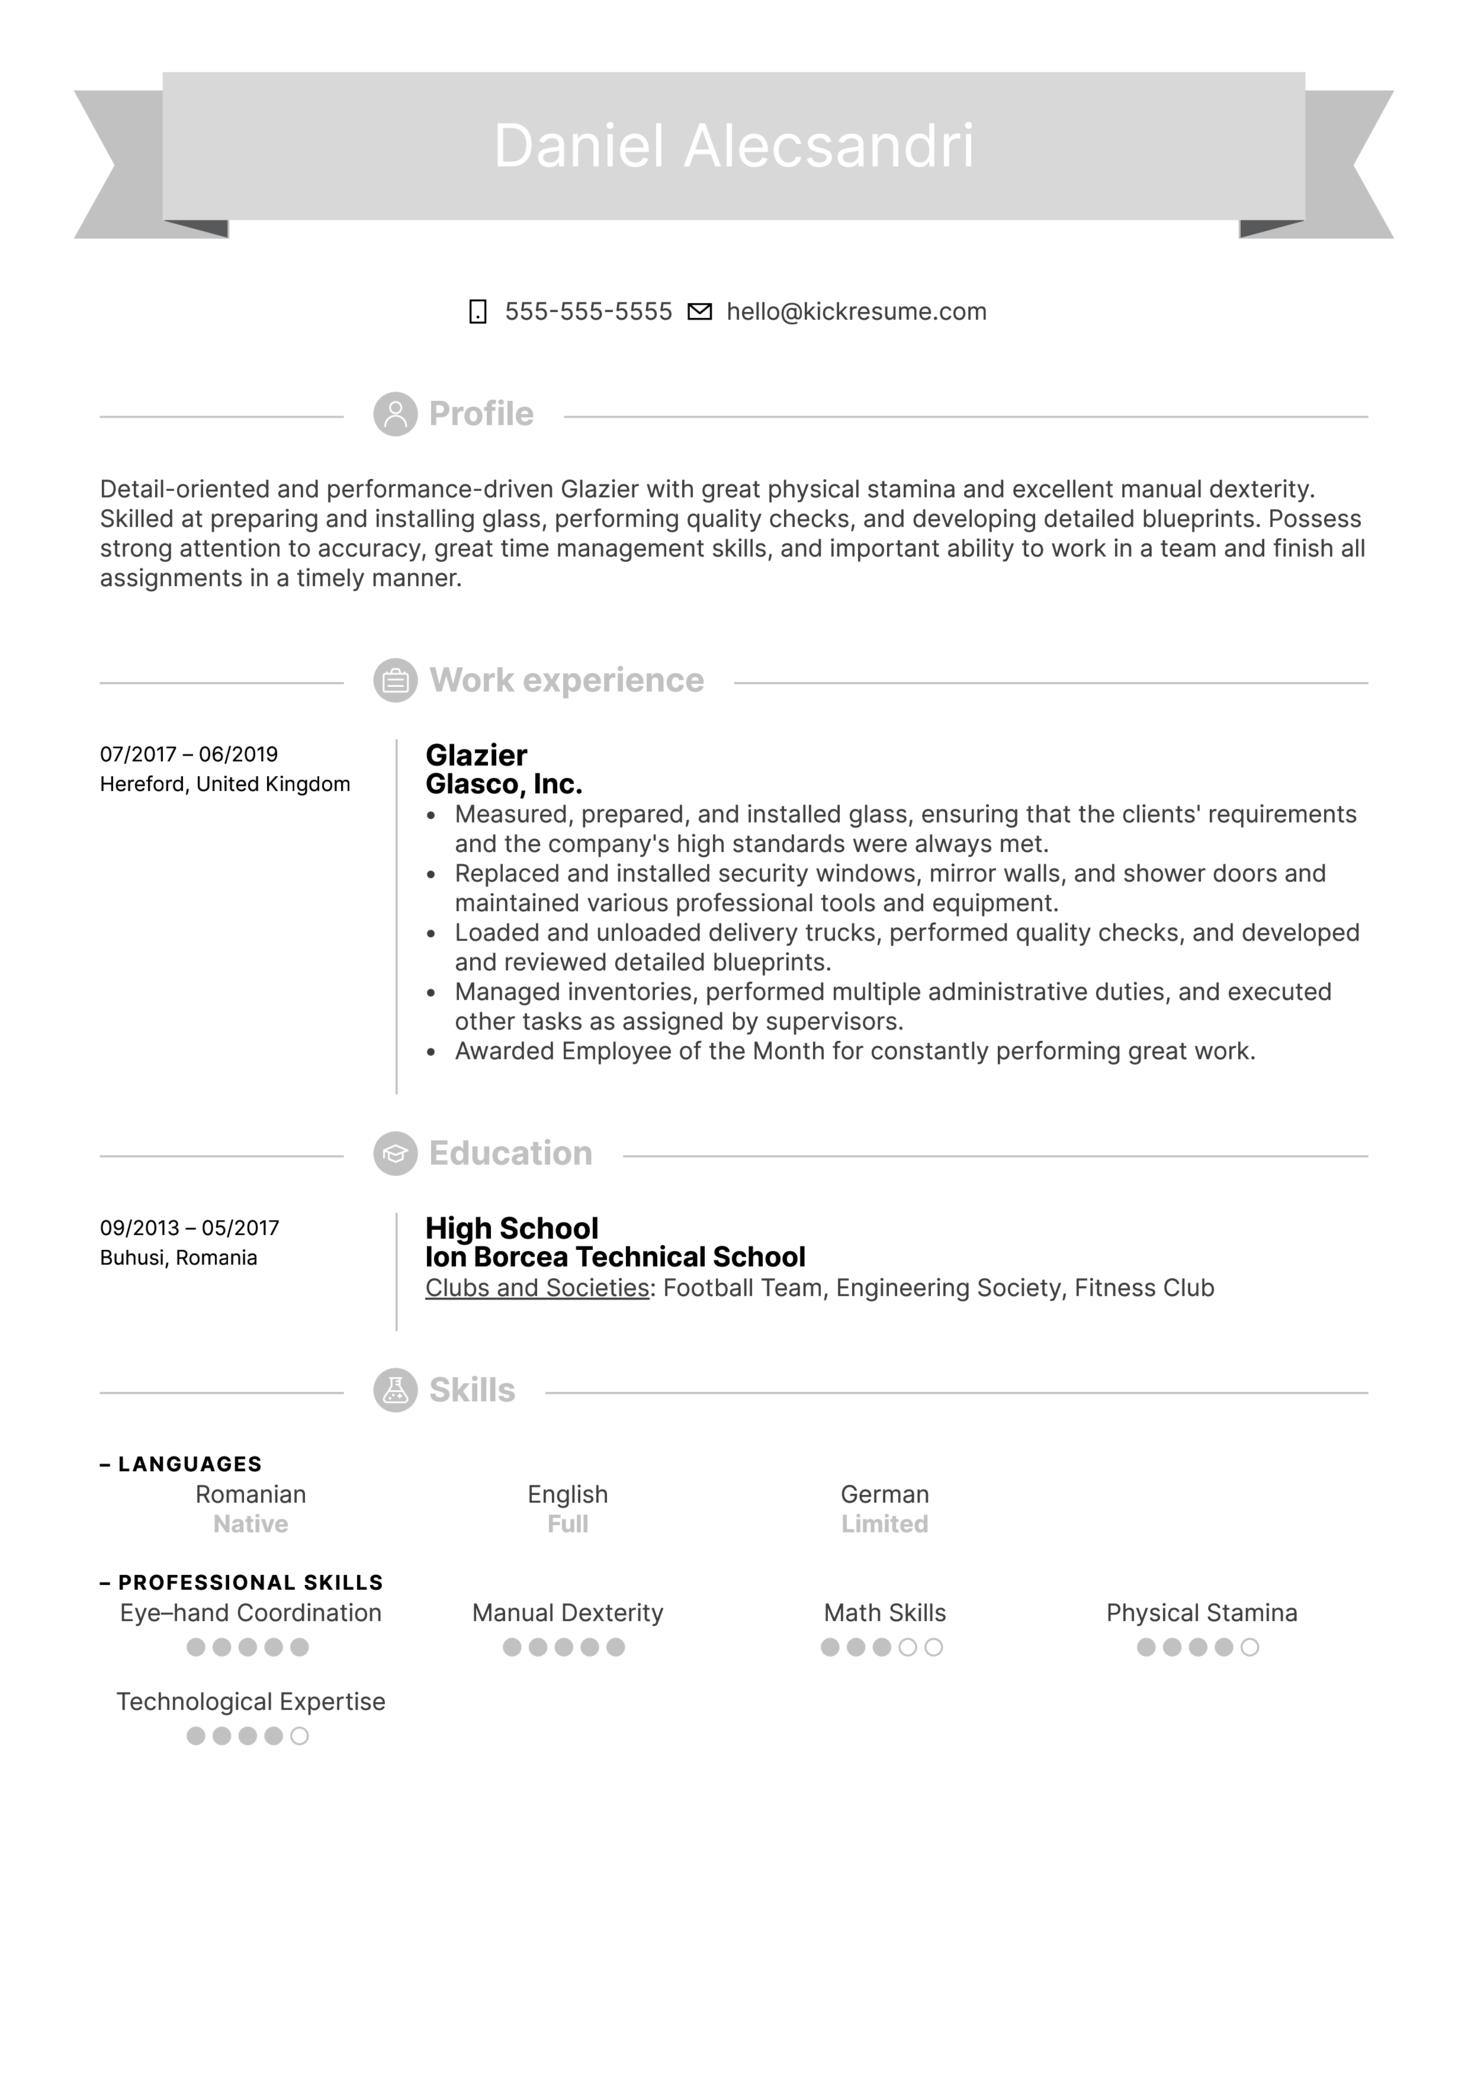 Glazier Resume Example (Part 1)